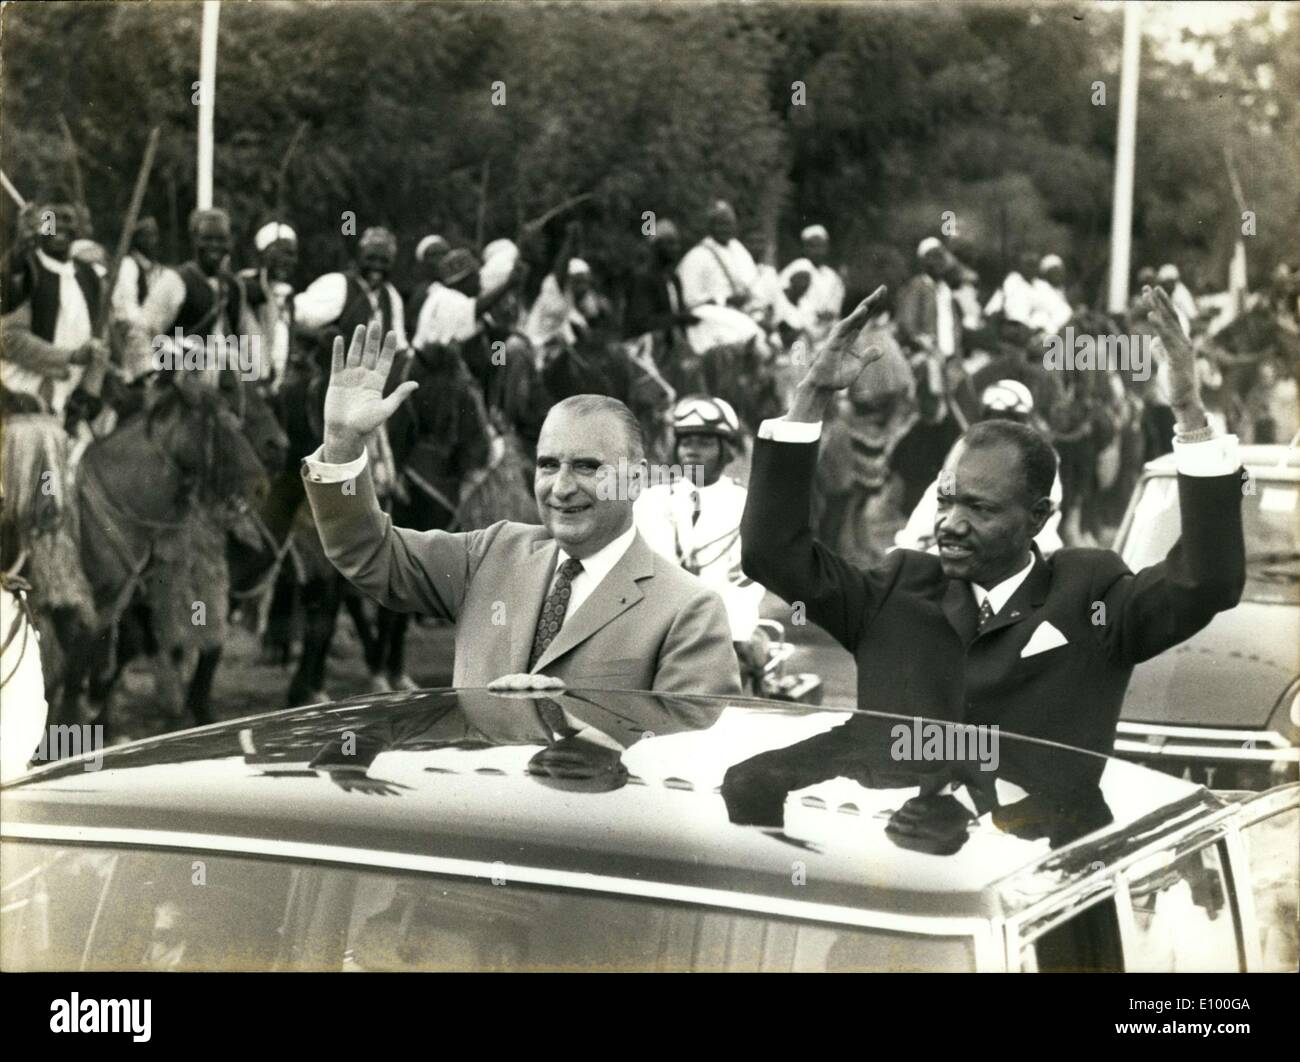 Jan. 28, 1972 - Presidents Pompidou & Tombalbaye (Tchad) Wave Fort Lamy Crowd APRESS.c - Stock Image